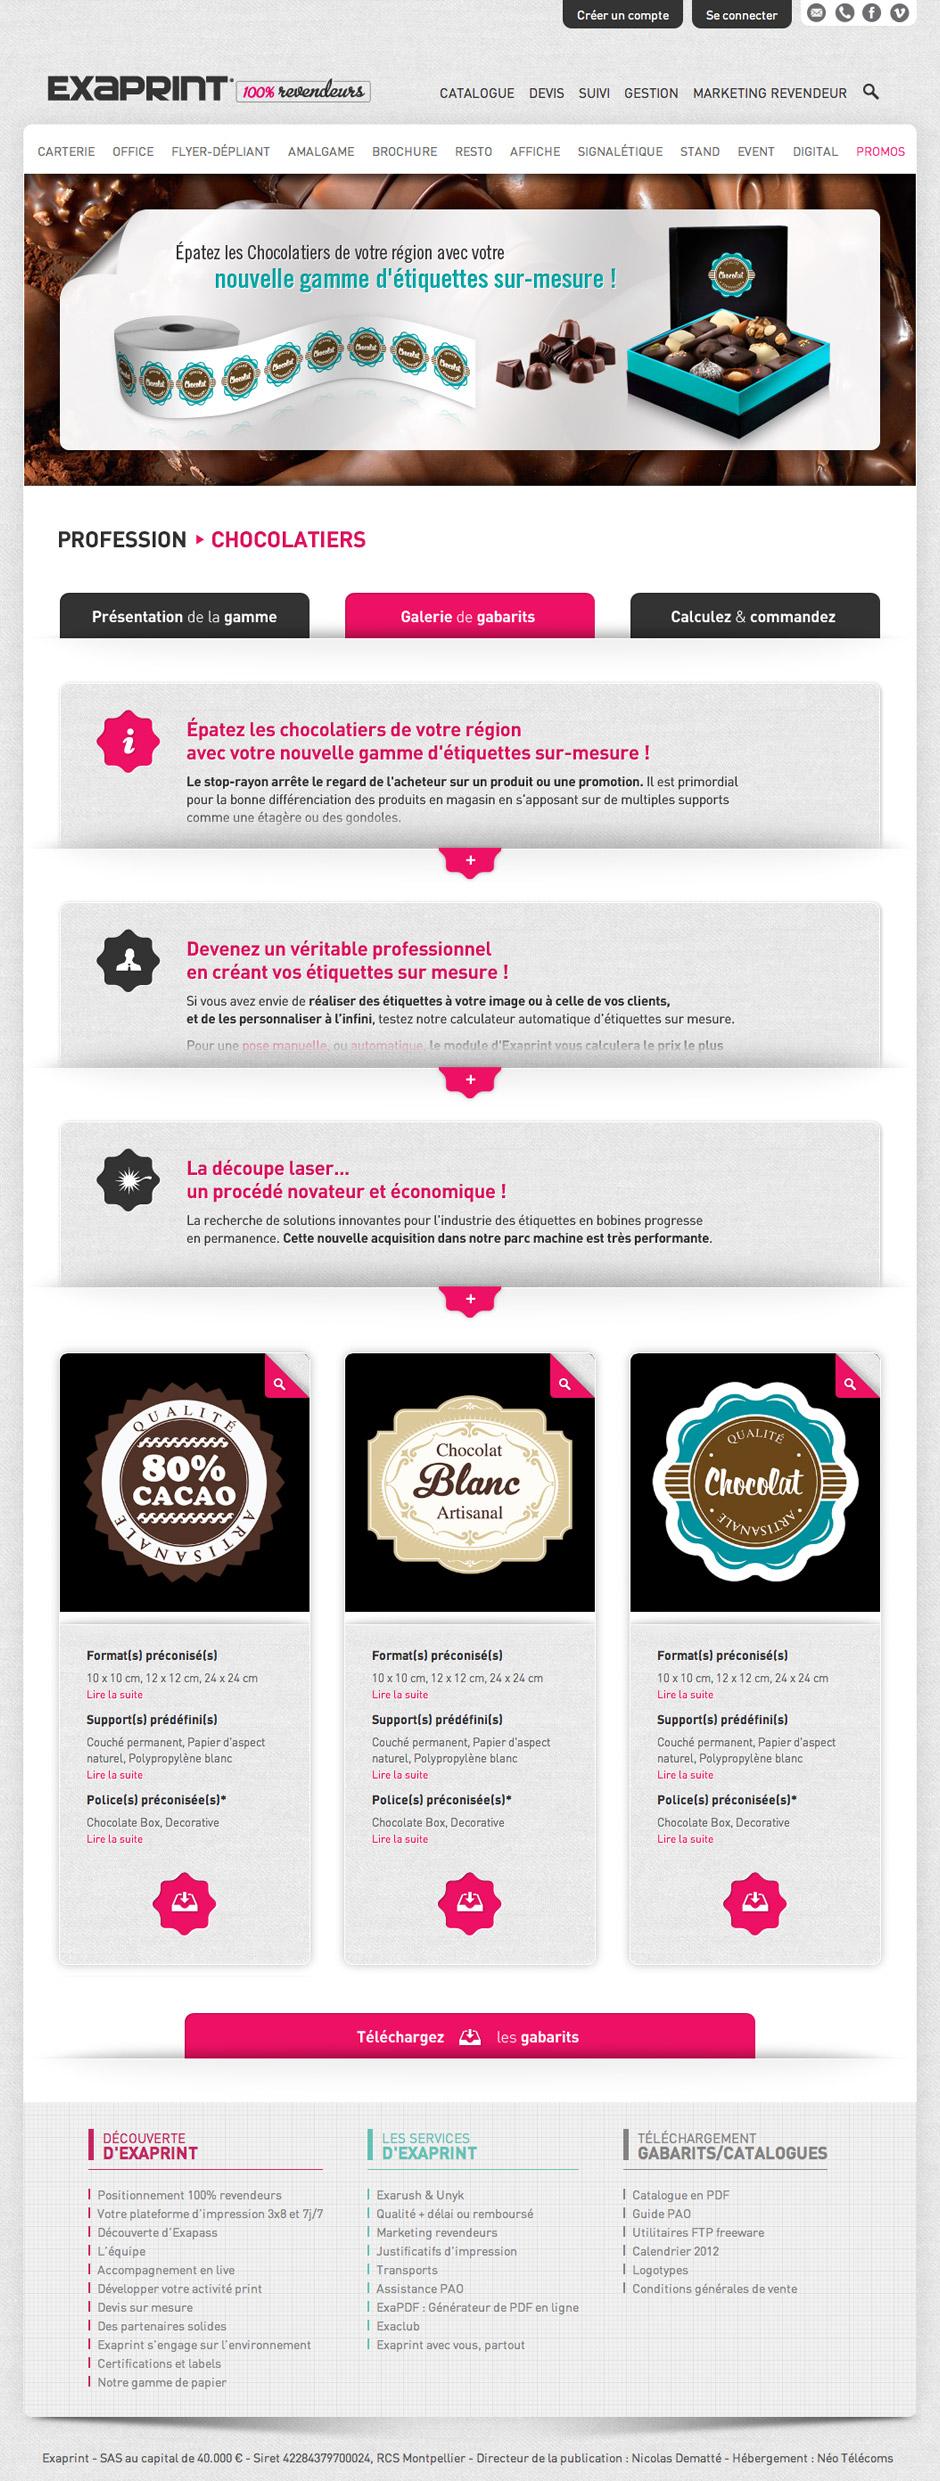 graphiste-montpellier-creation-exaprint-etiquettes-sticker-rolls-agence-communication-montpellier-caconcept-alexis-cretin-1